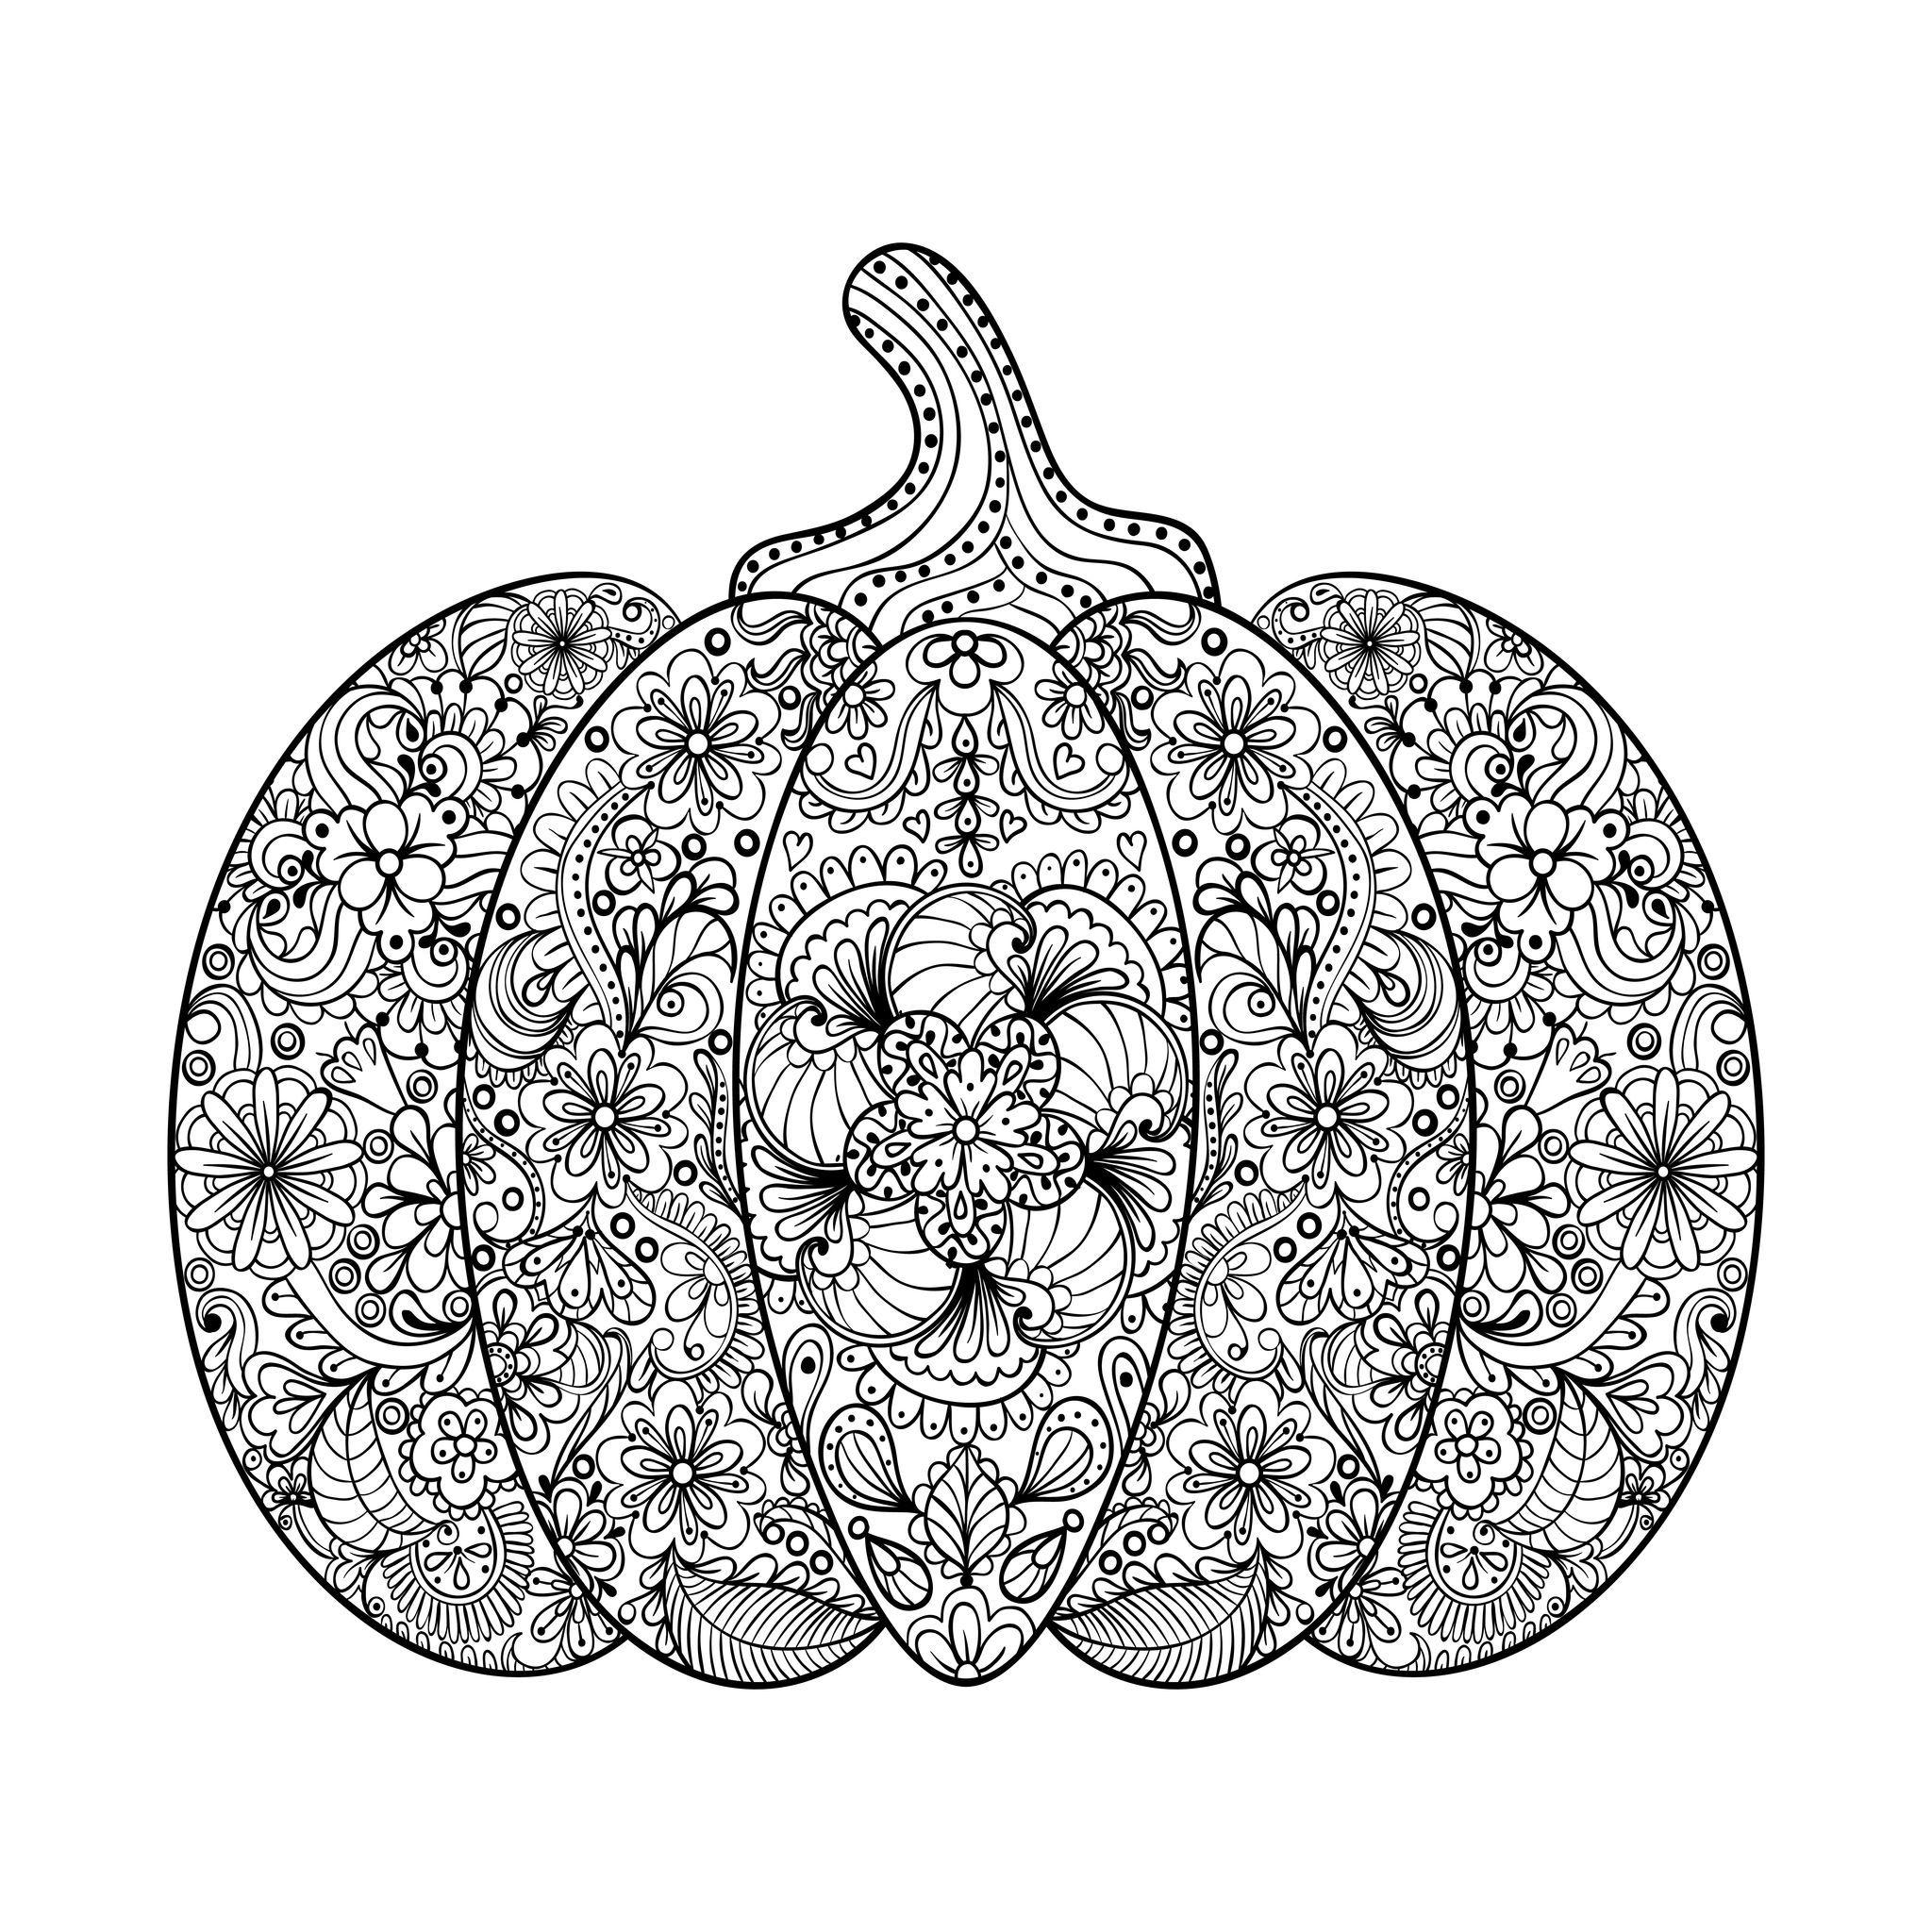 2048x2048 Magnificent Halloween Pumpkin, Filled With Flowered Patterns,